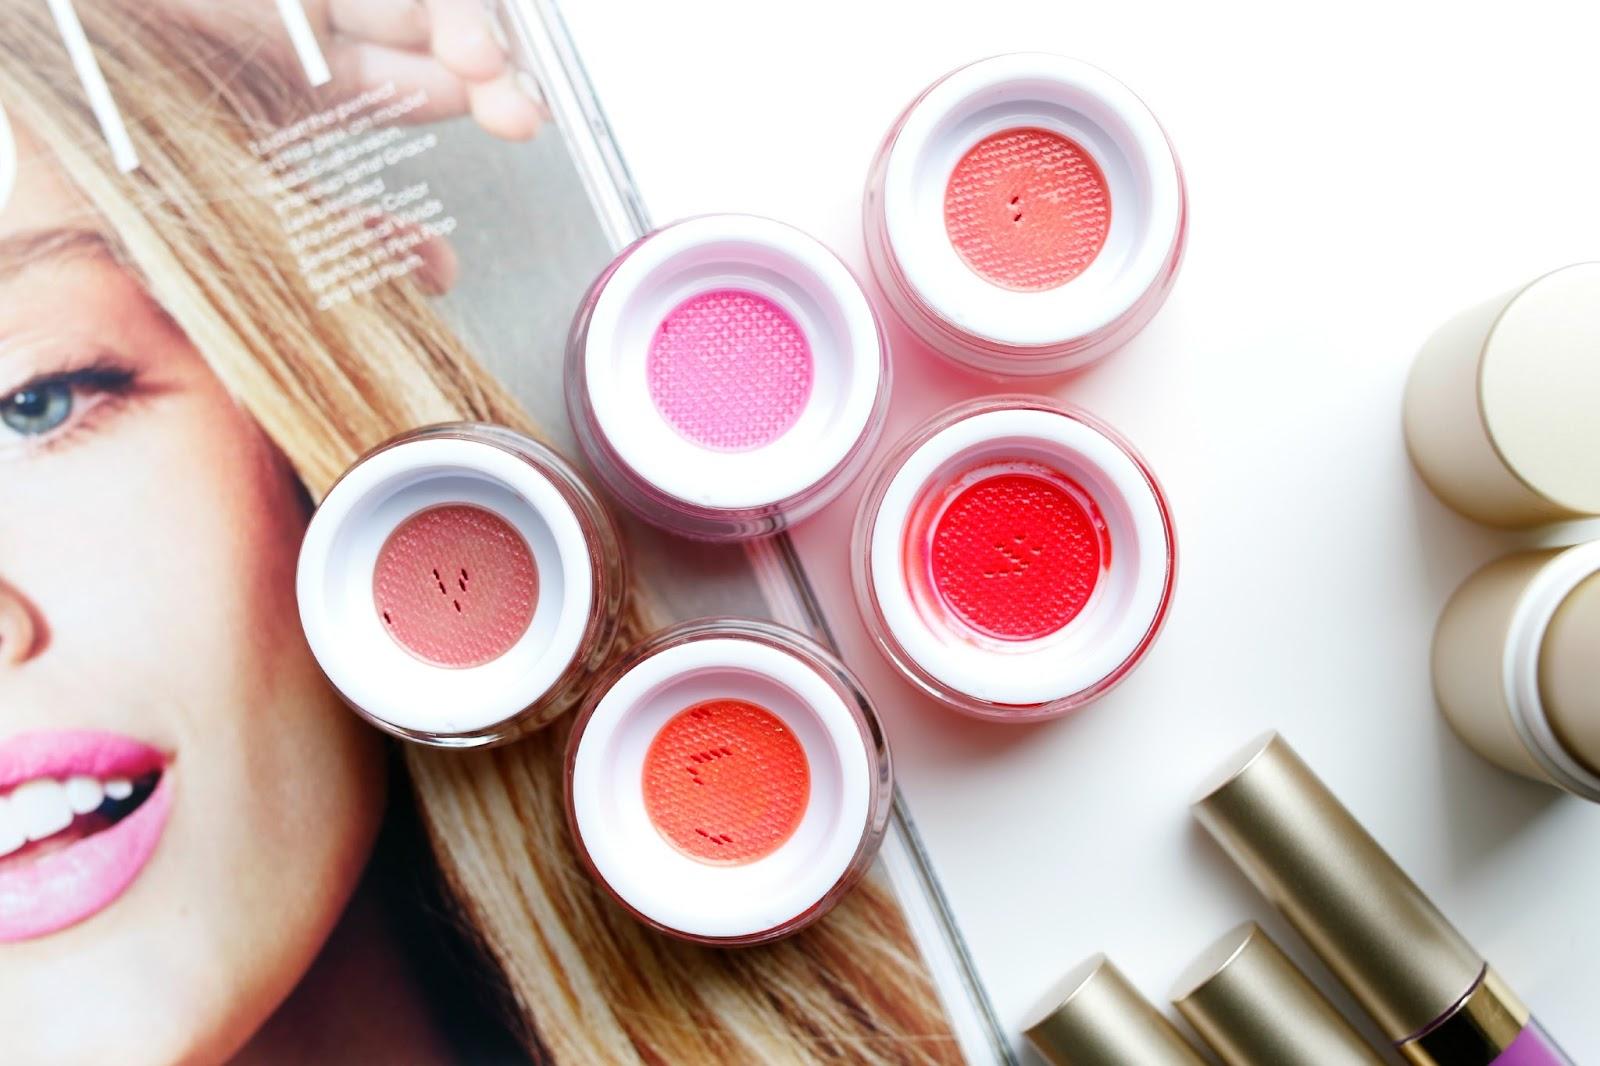 Stila aqua glow blush swatches on fair skin